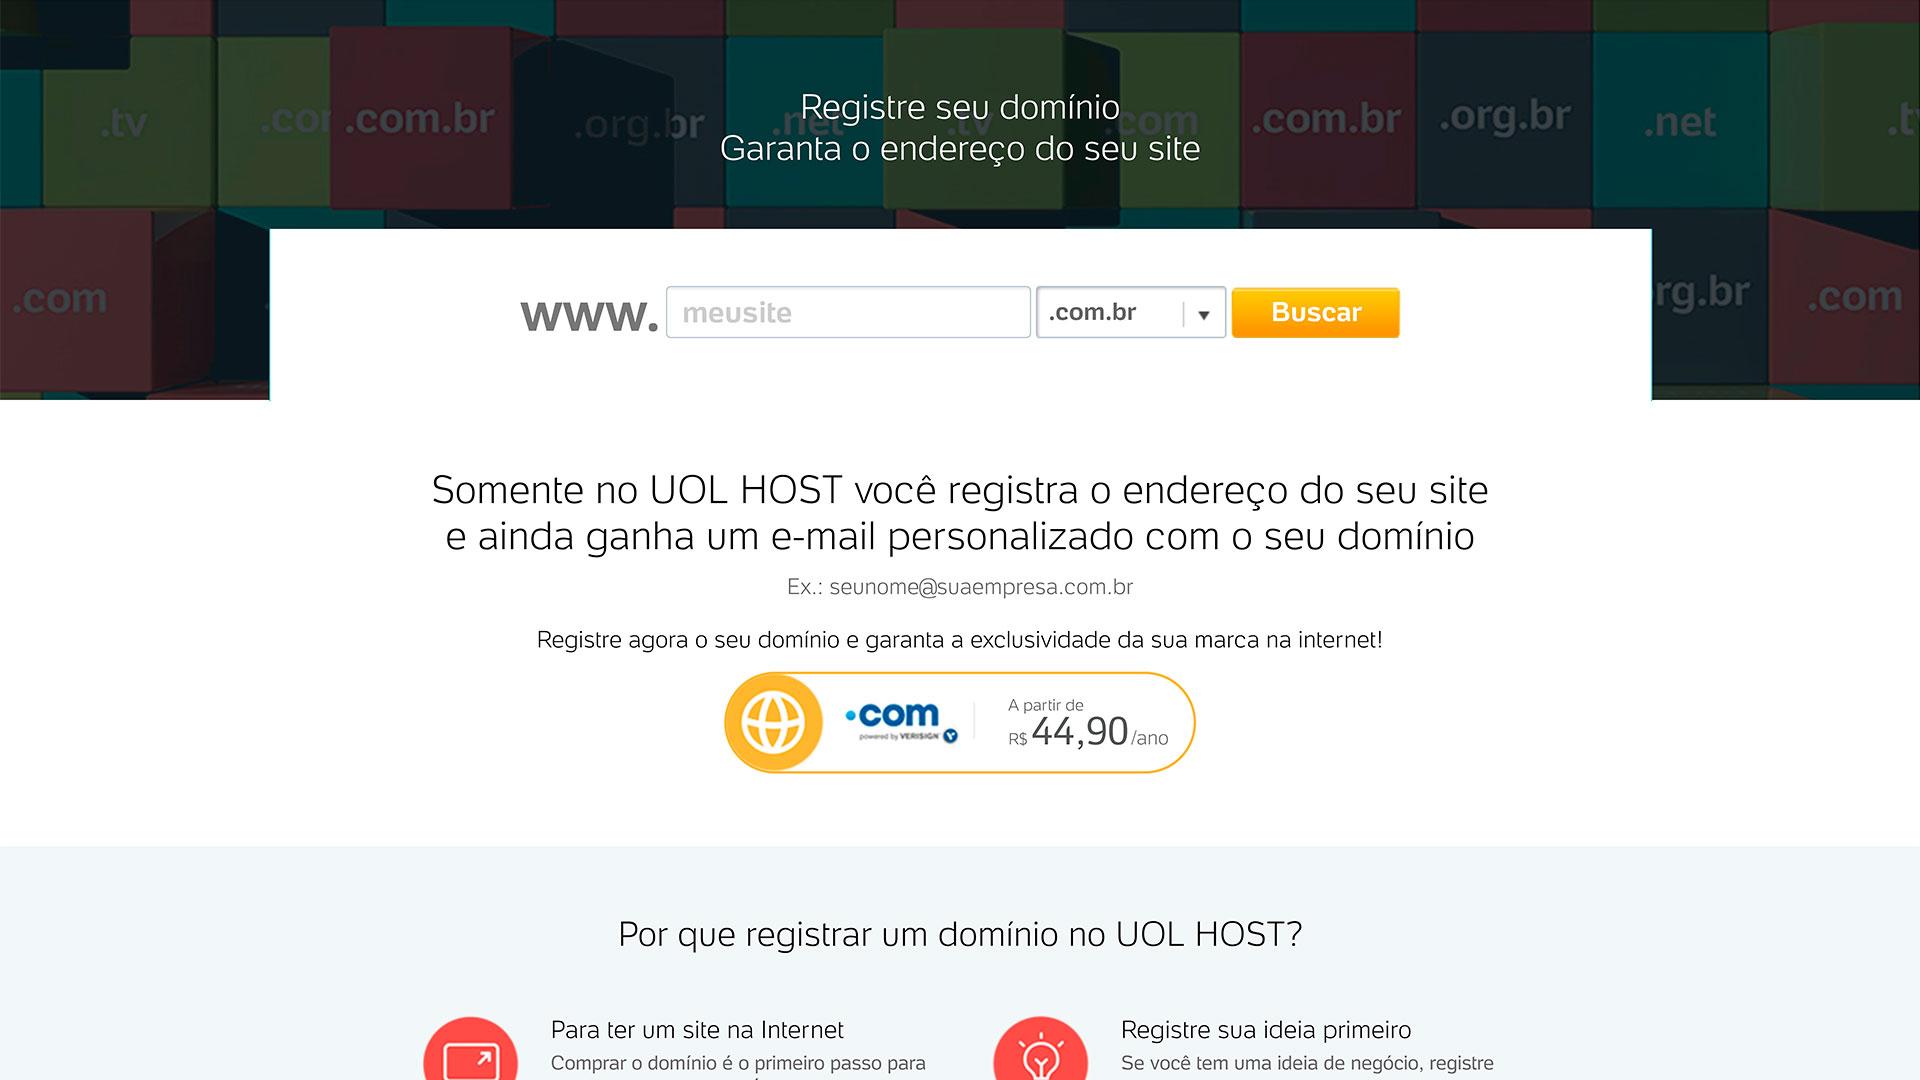 uol host registro de dominio